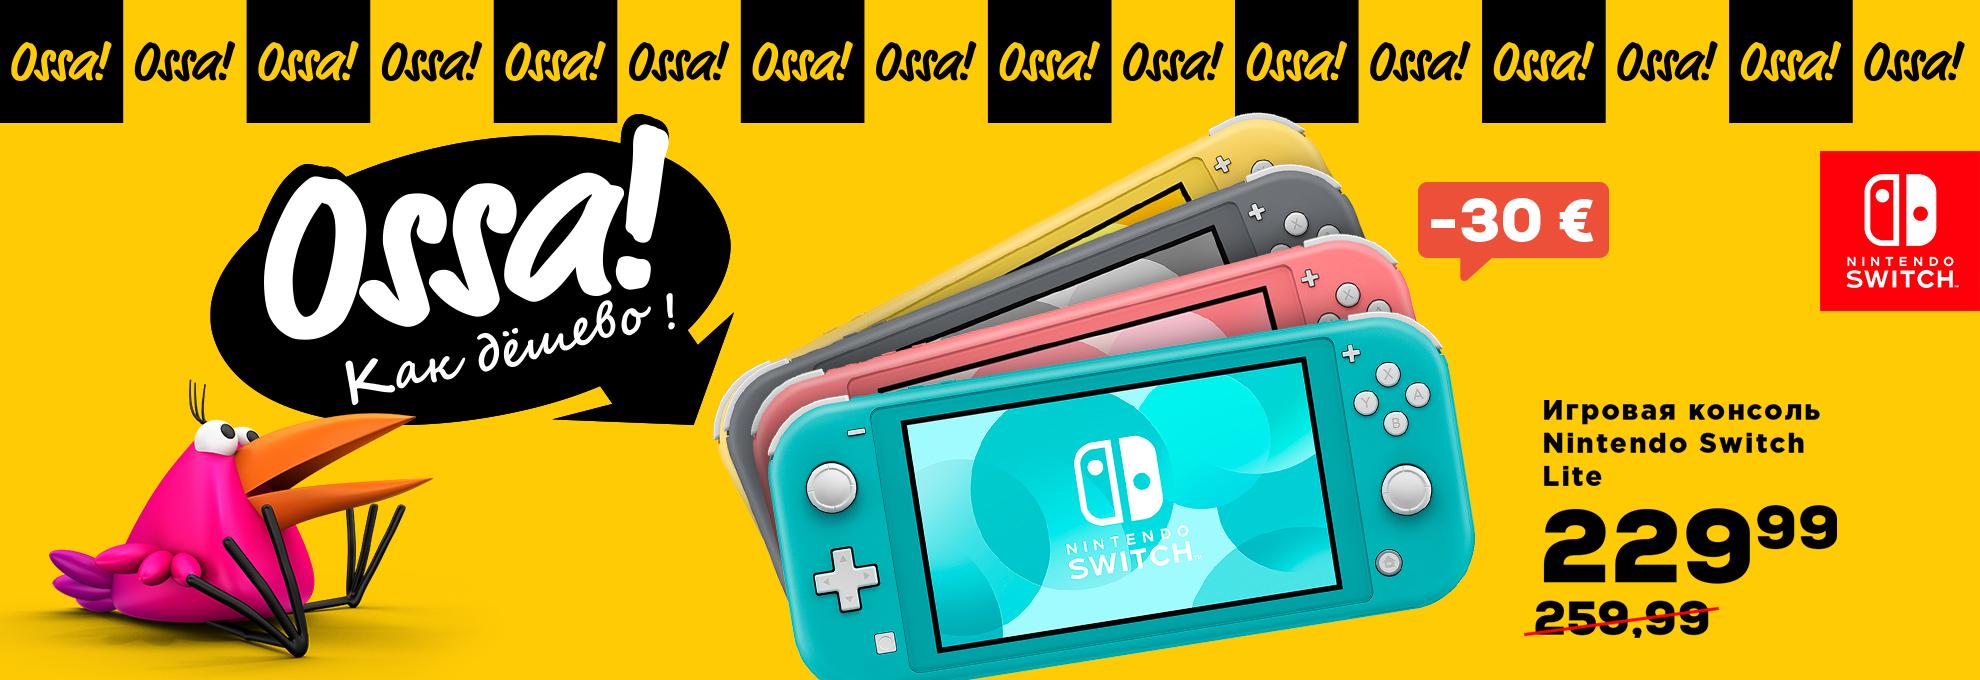 Ossa! Nintendo Switch